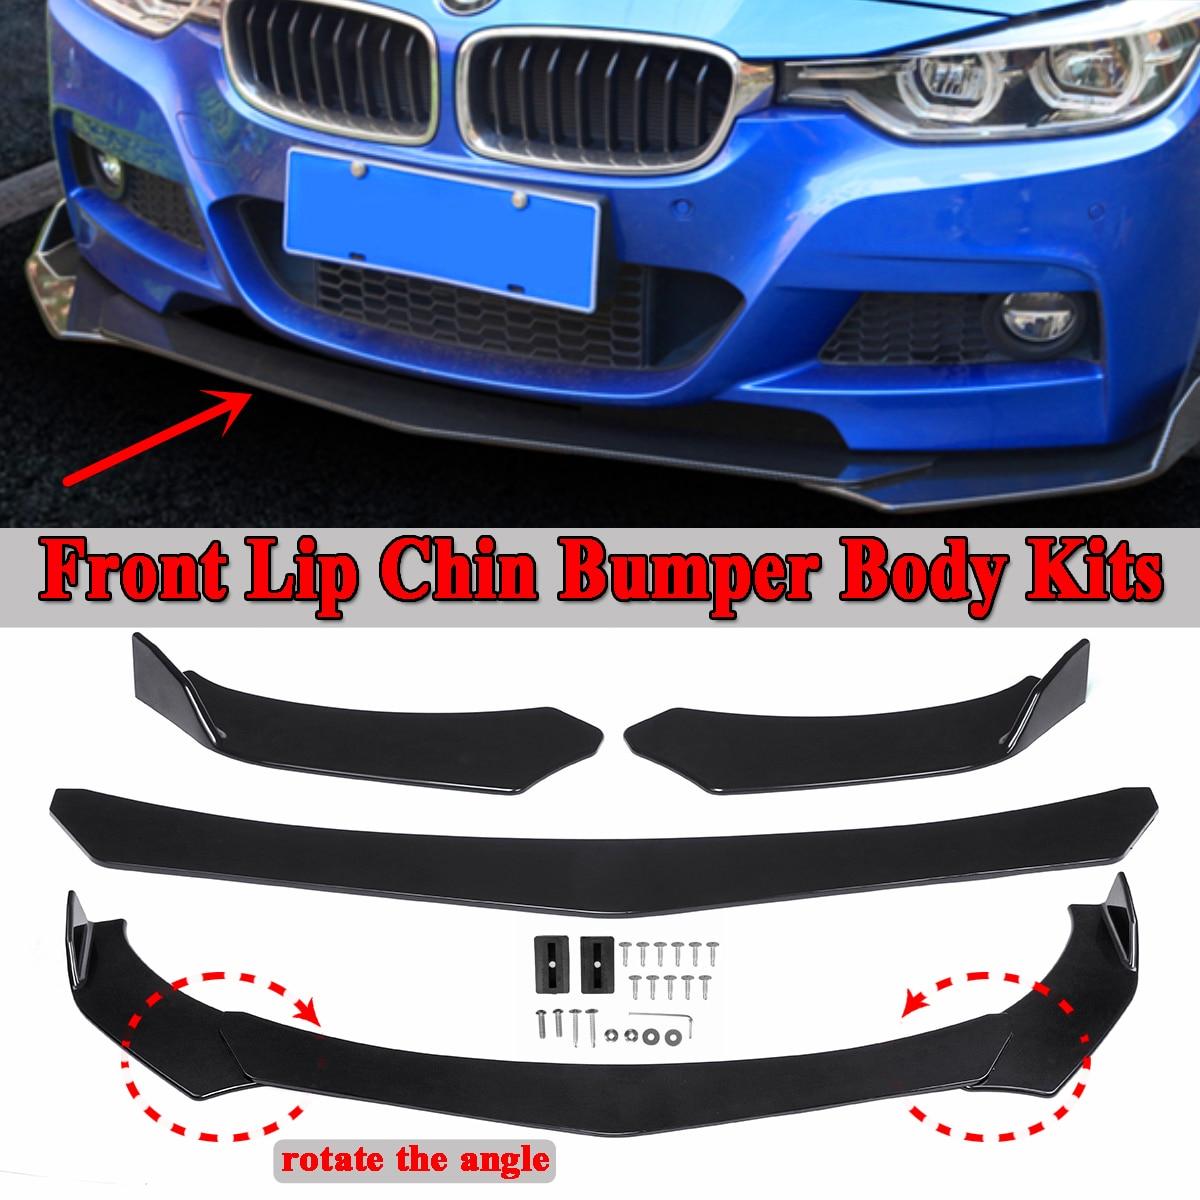 New 3pcs Car Universal Black Front Bumper Spoiler Lip Body Kits Rotate The Angle For BMW E36 E46 E60 E63 E64 E90 E91 E92 E93